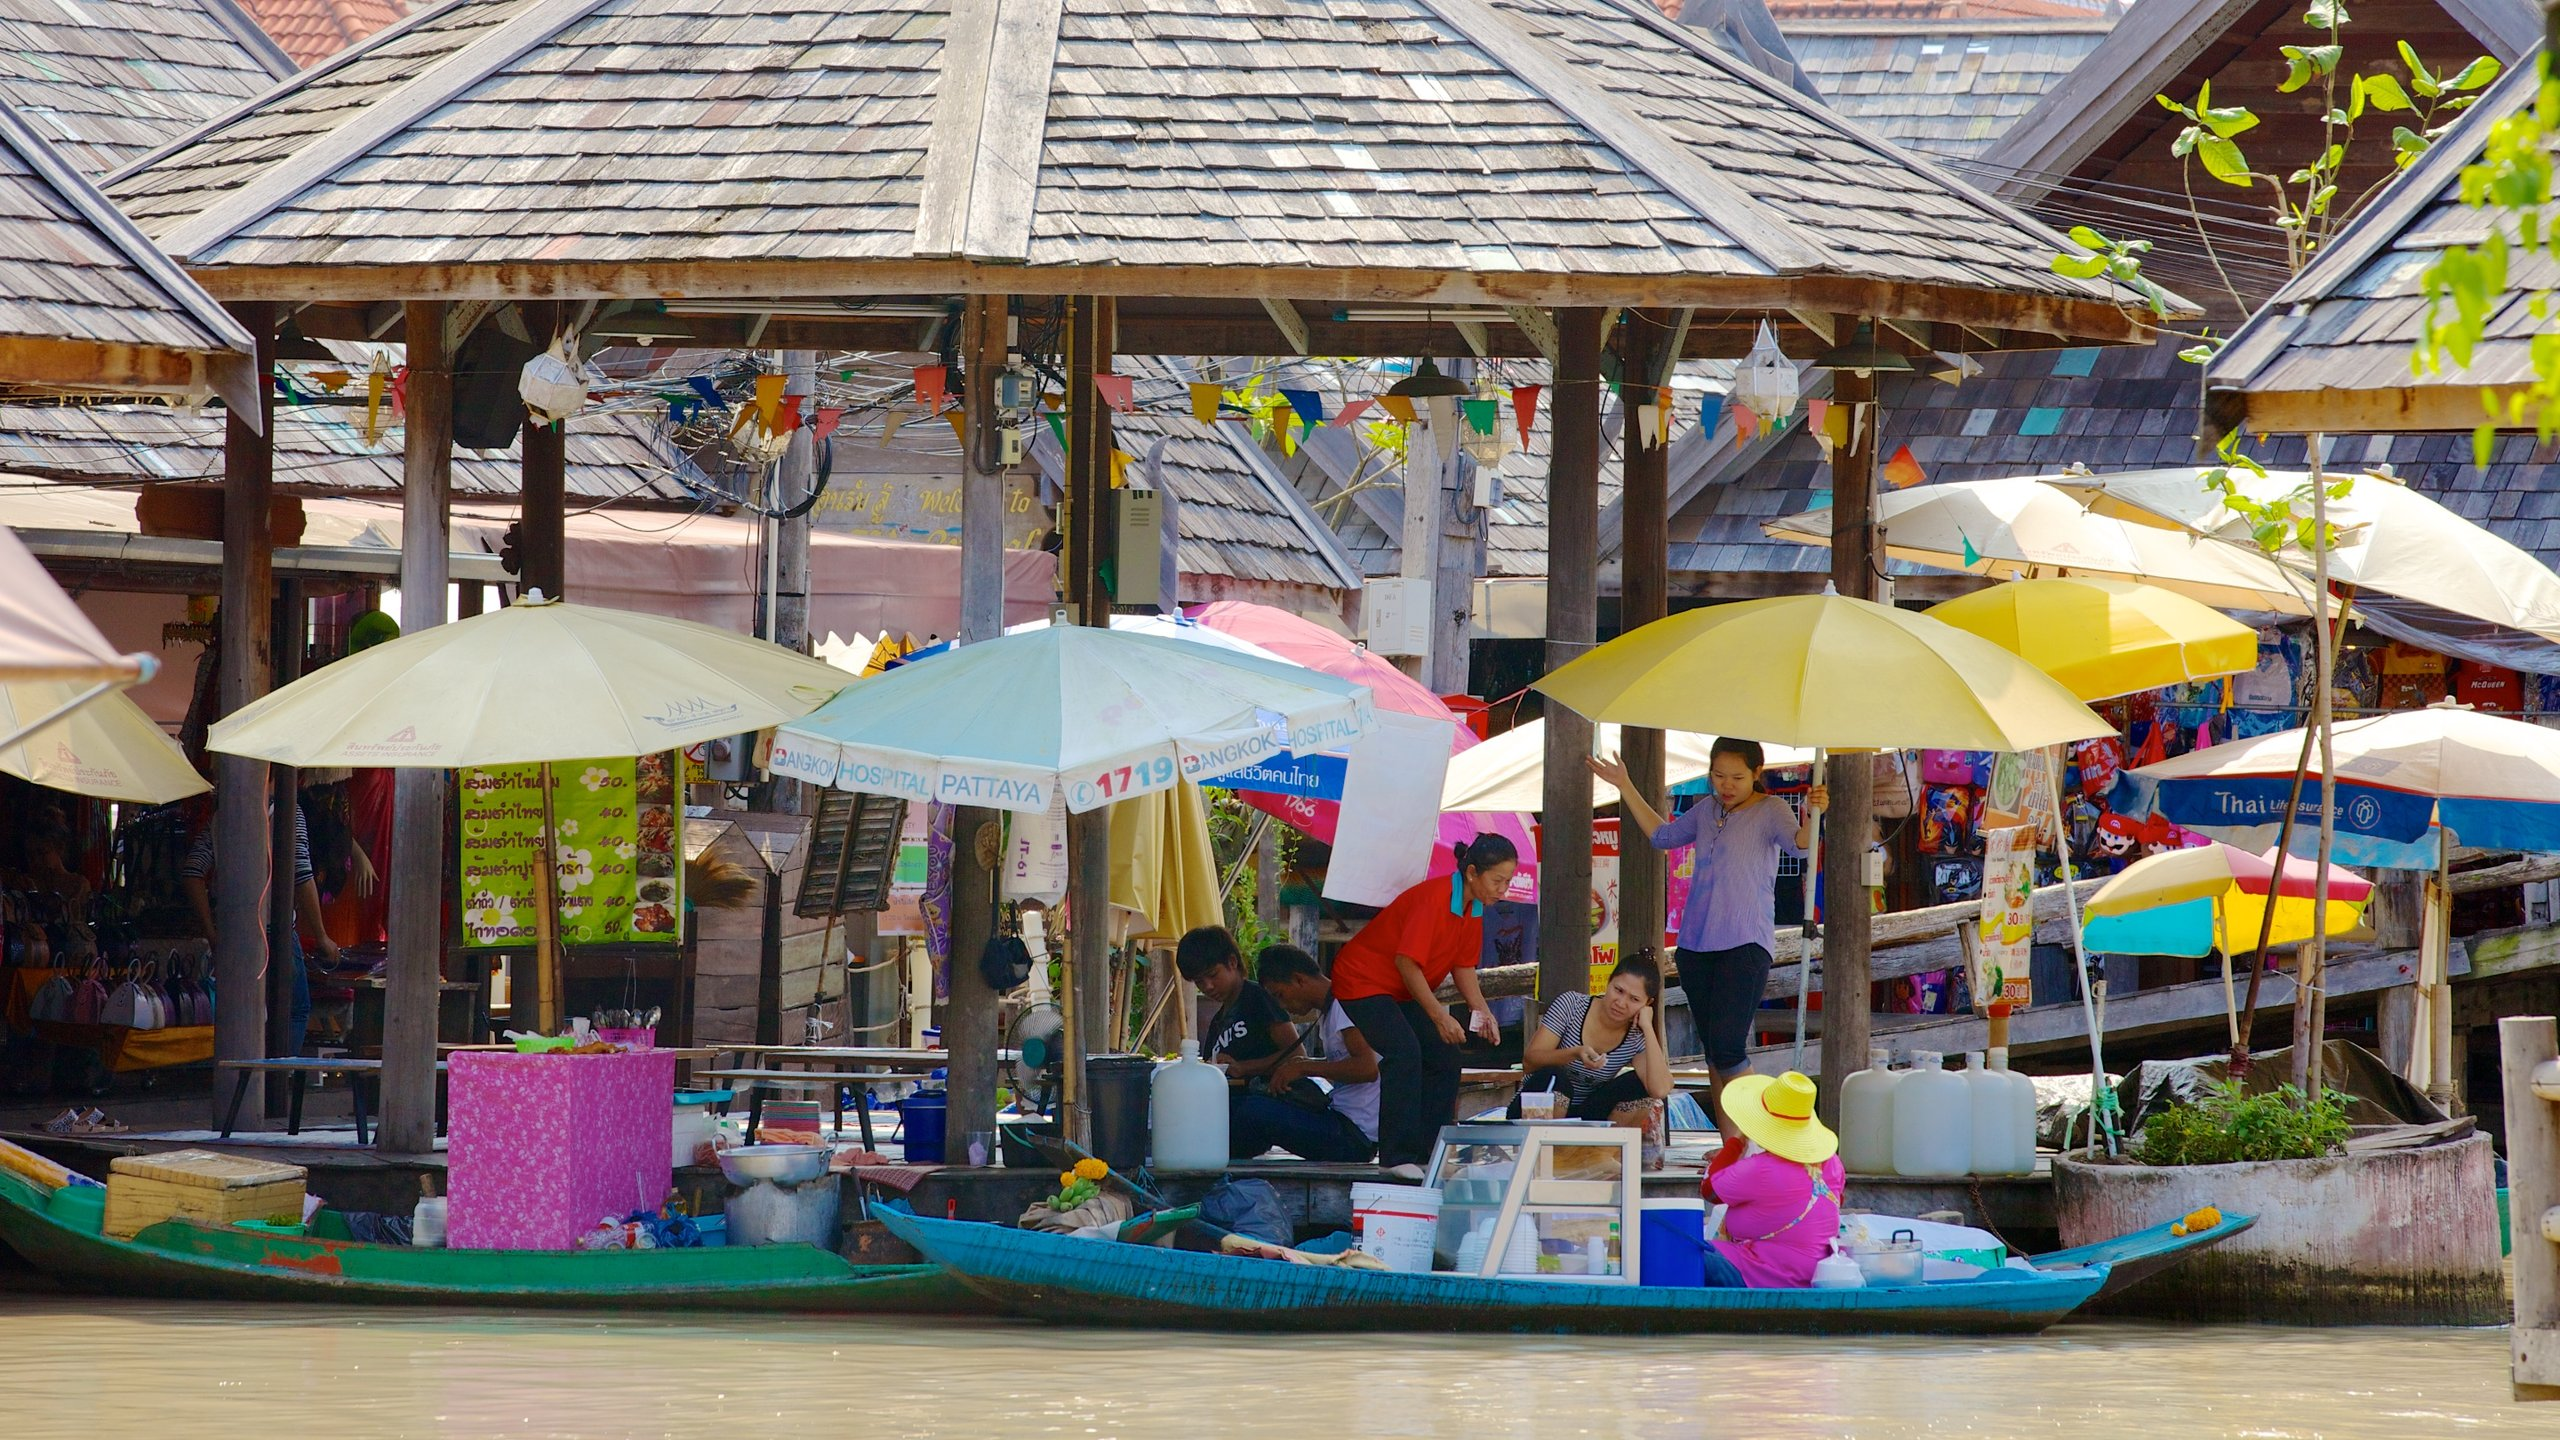 Na Kluea, Pattaya, Chonburi Province, Thailand